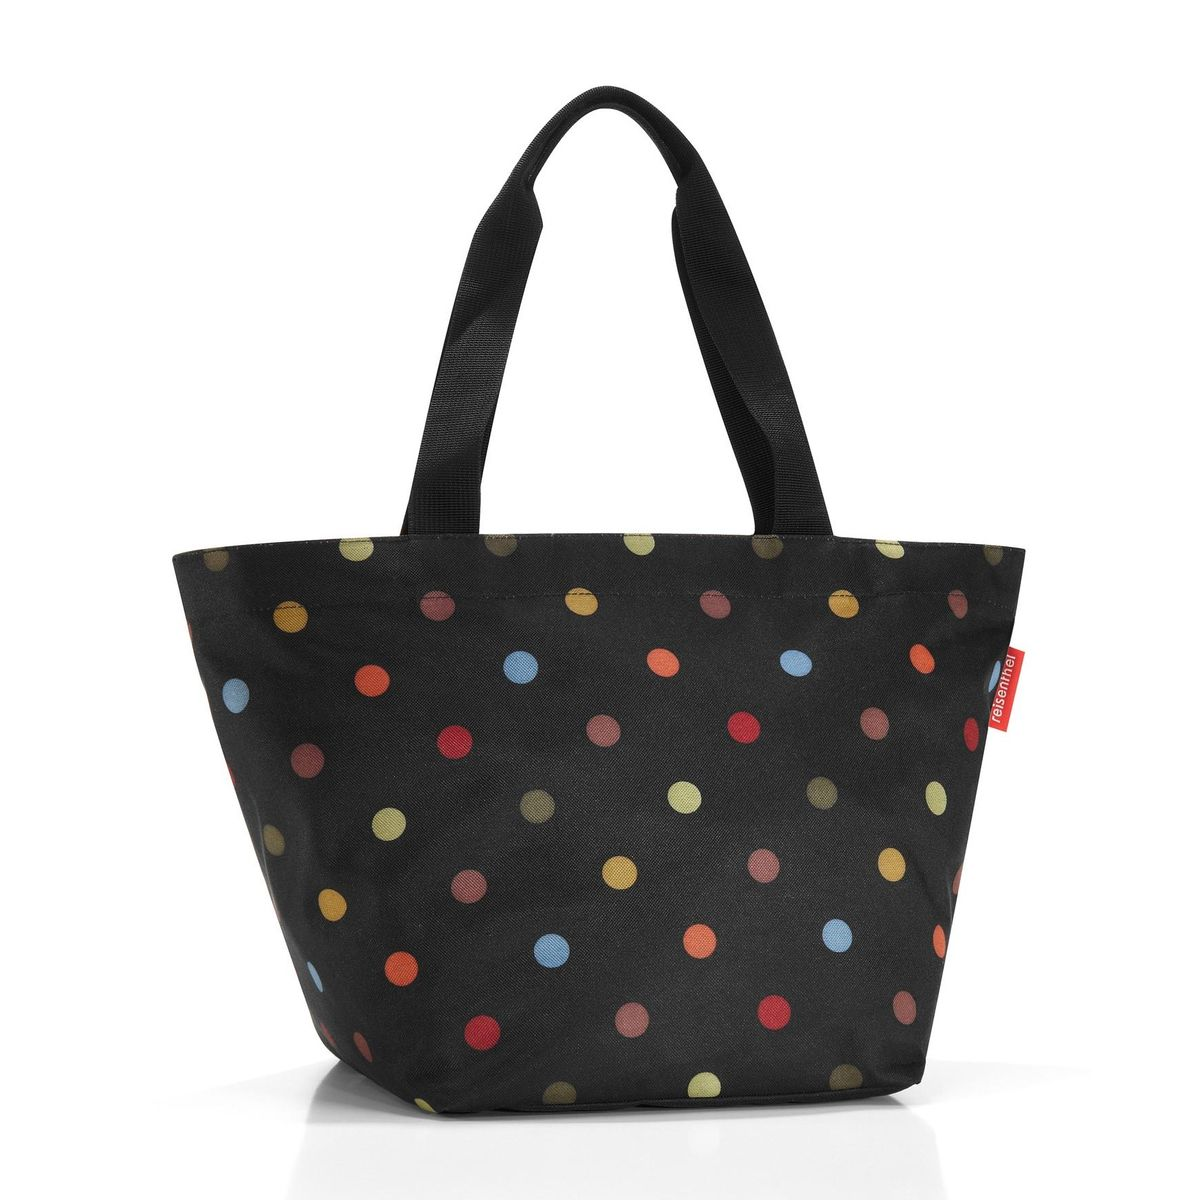 reisenthel shopper shopping bag reisenthel bags baskets baskets storage accessories. Black Bedroom Furniture Sets. Home Design Ideas